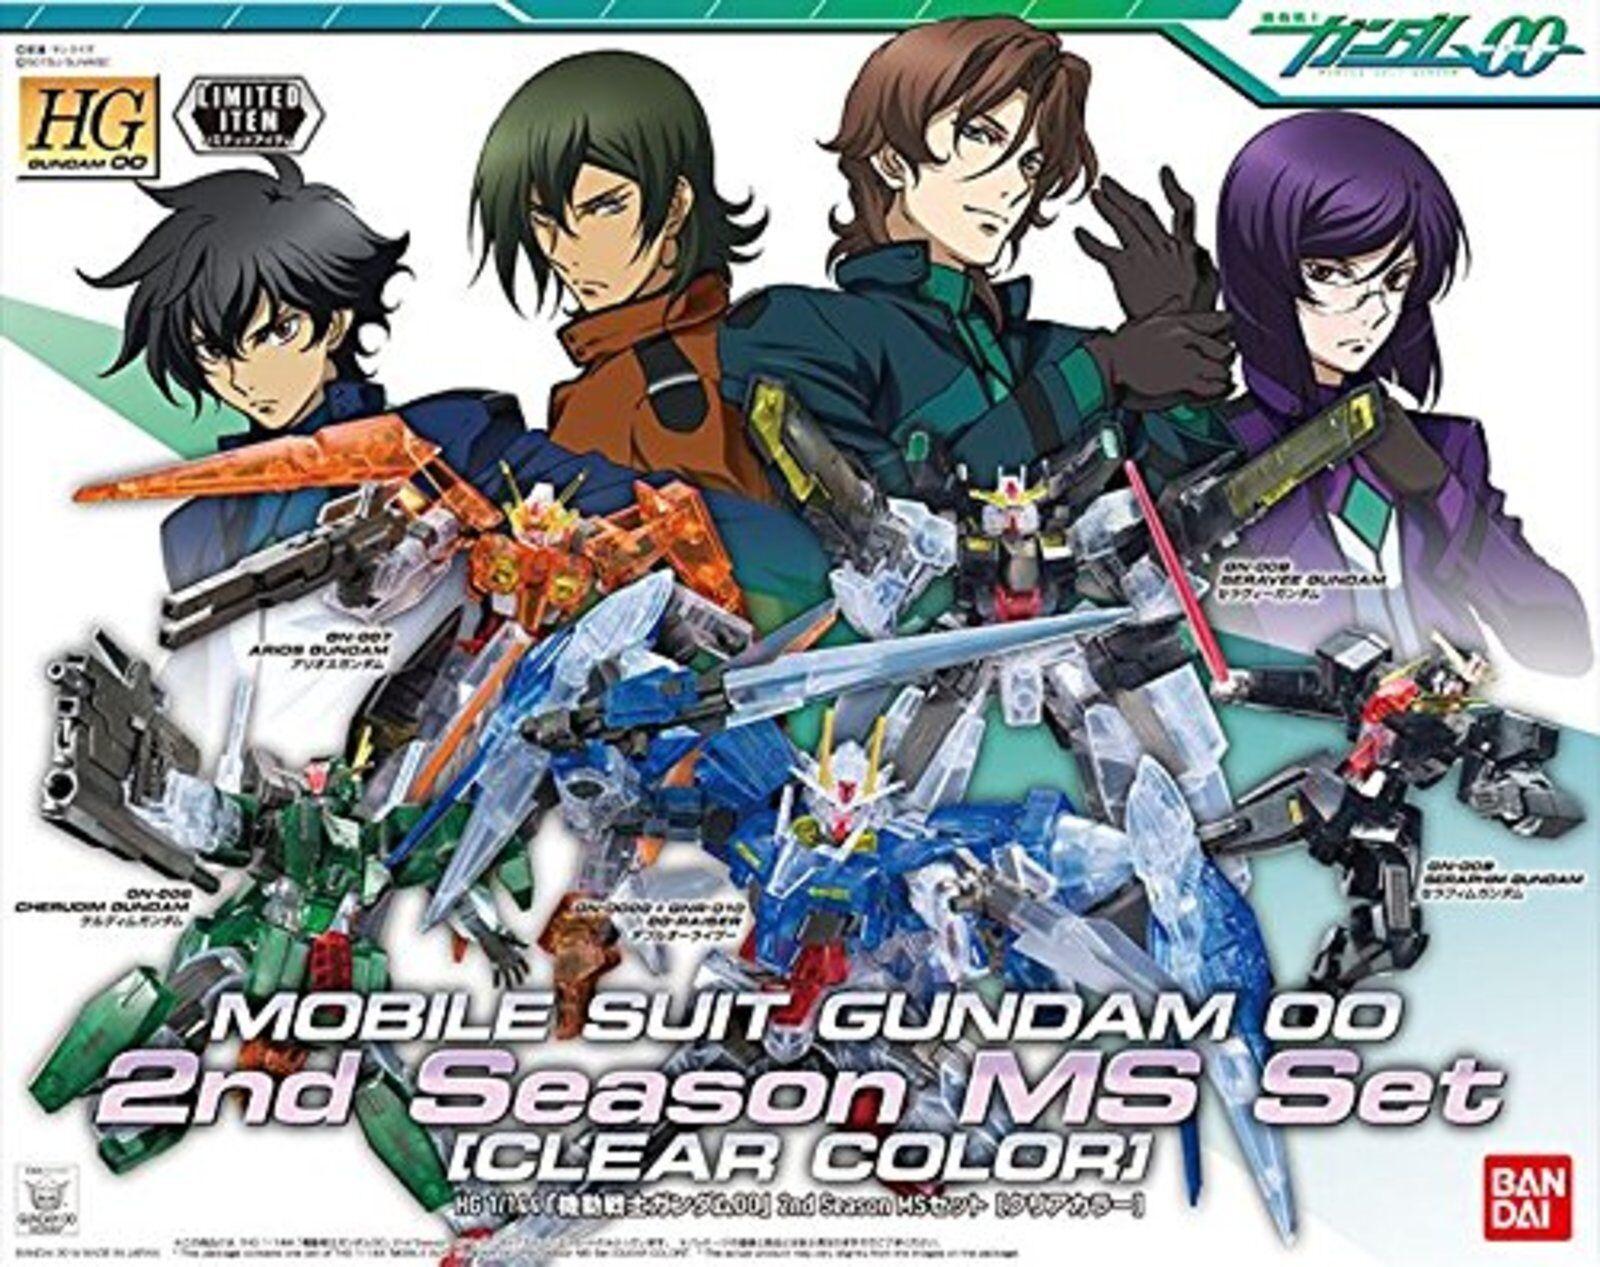 Gundam Basis Tokyo Limitiert Gundam00 00 2. Staffel Klar Farbe Modell Bausatz